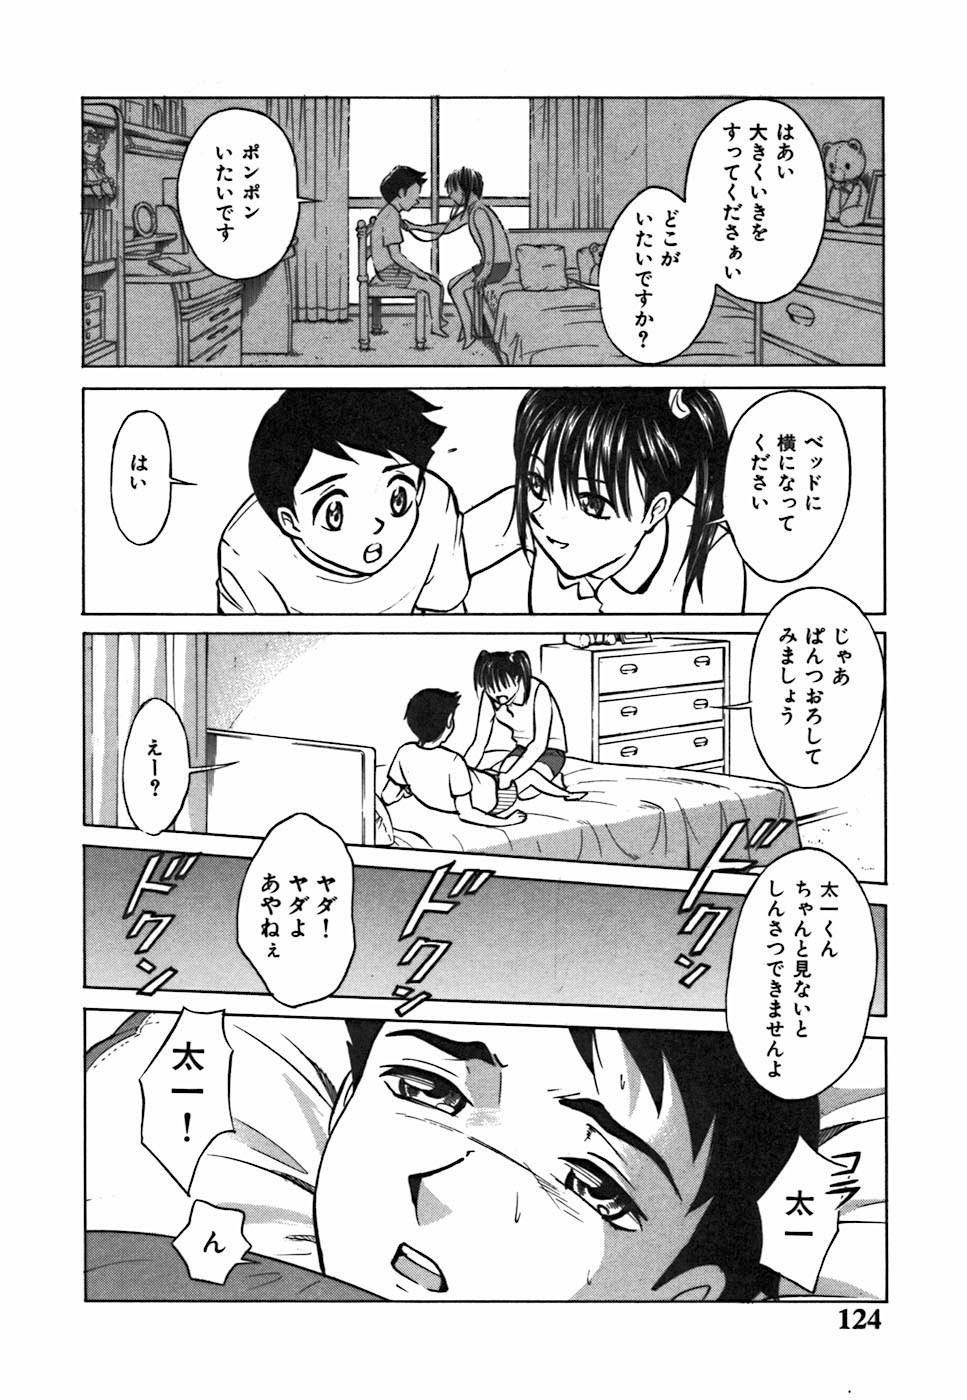 Kimi ga Nozomu Katachi | Appearance for which you hope 123